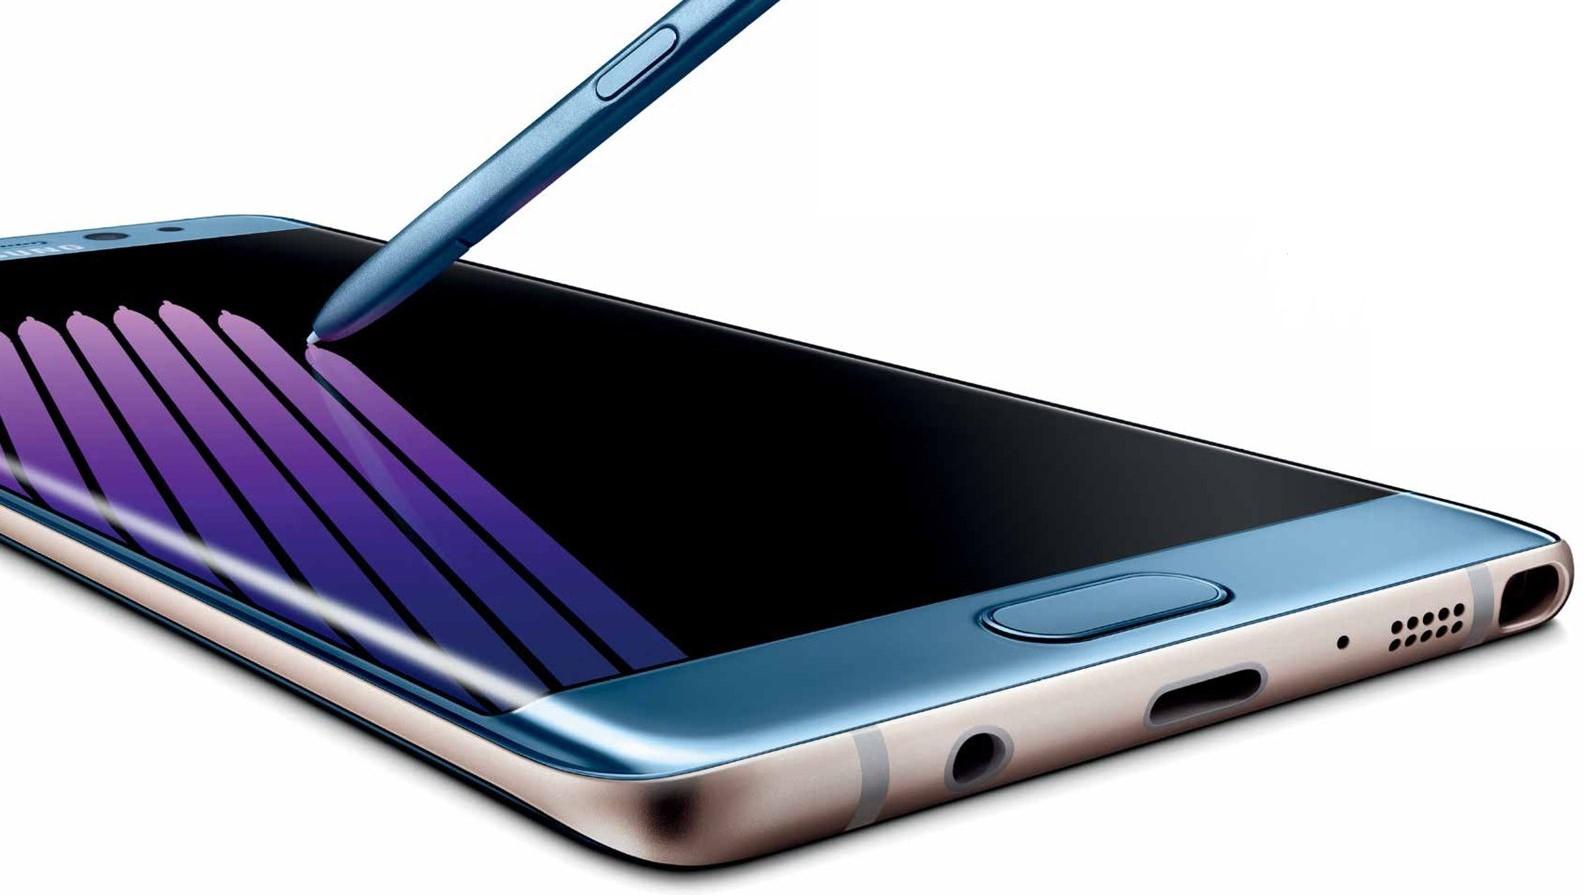 Note-7-prima-foto-in-HD-per-il-top-di-gamma-di-Samsung